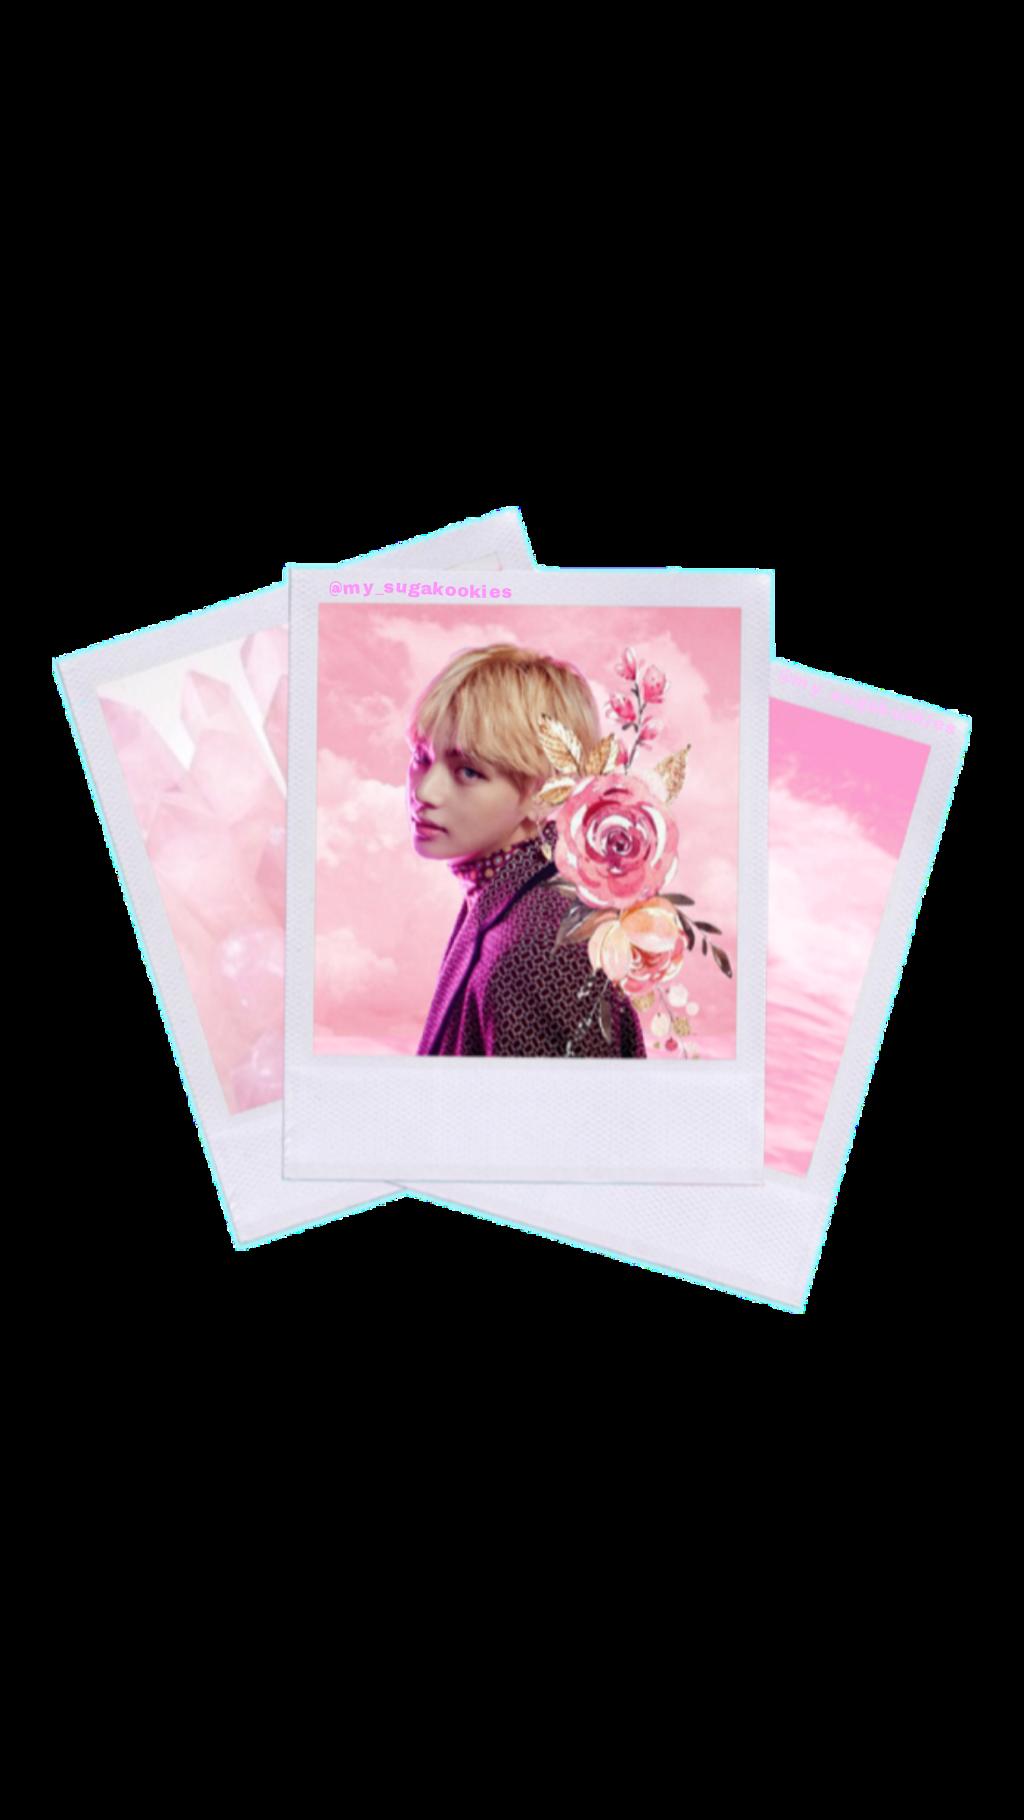 Tae sticker #taehyung #btstae #btstaehyung #btsv #bts #btsedit #btssticker #taehyungsticker #btsvsticker #freetoedit